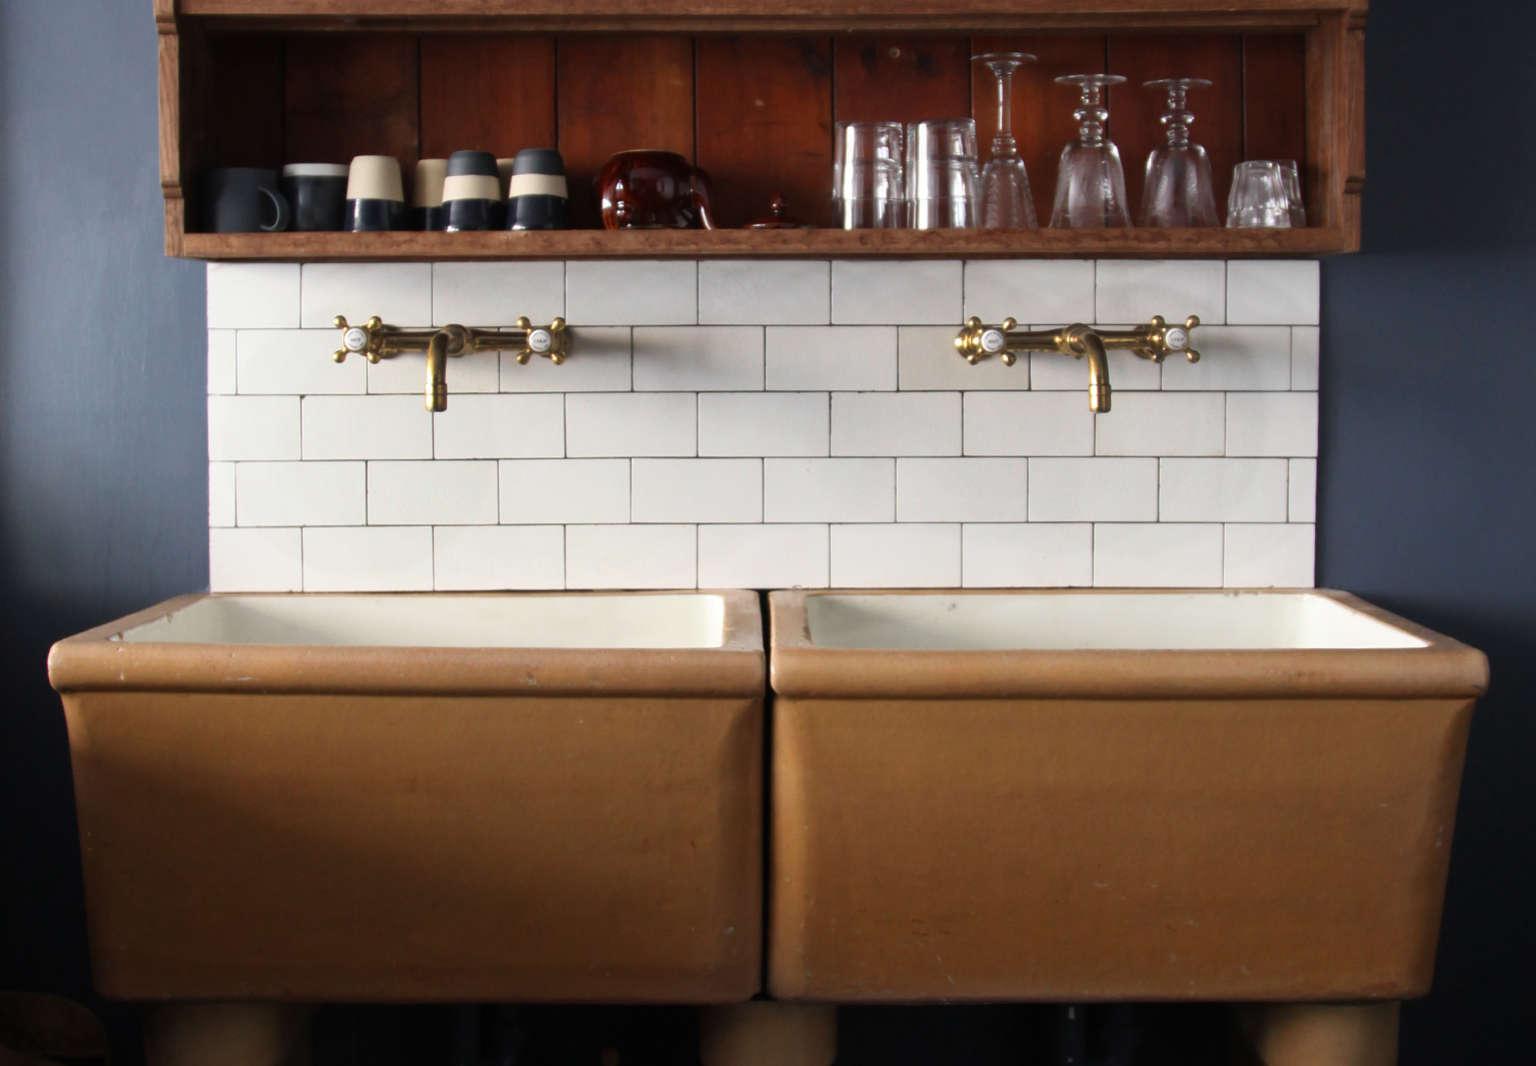 berdoulat mews house vintage ceramic kitchen sink bath england berdoulat studios photo 4